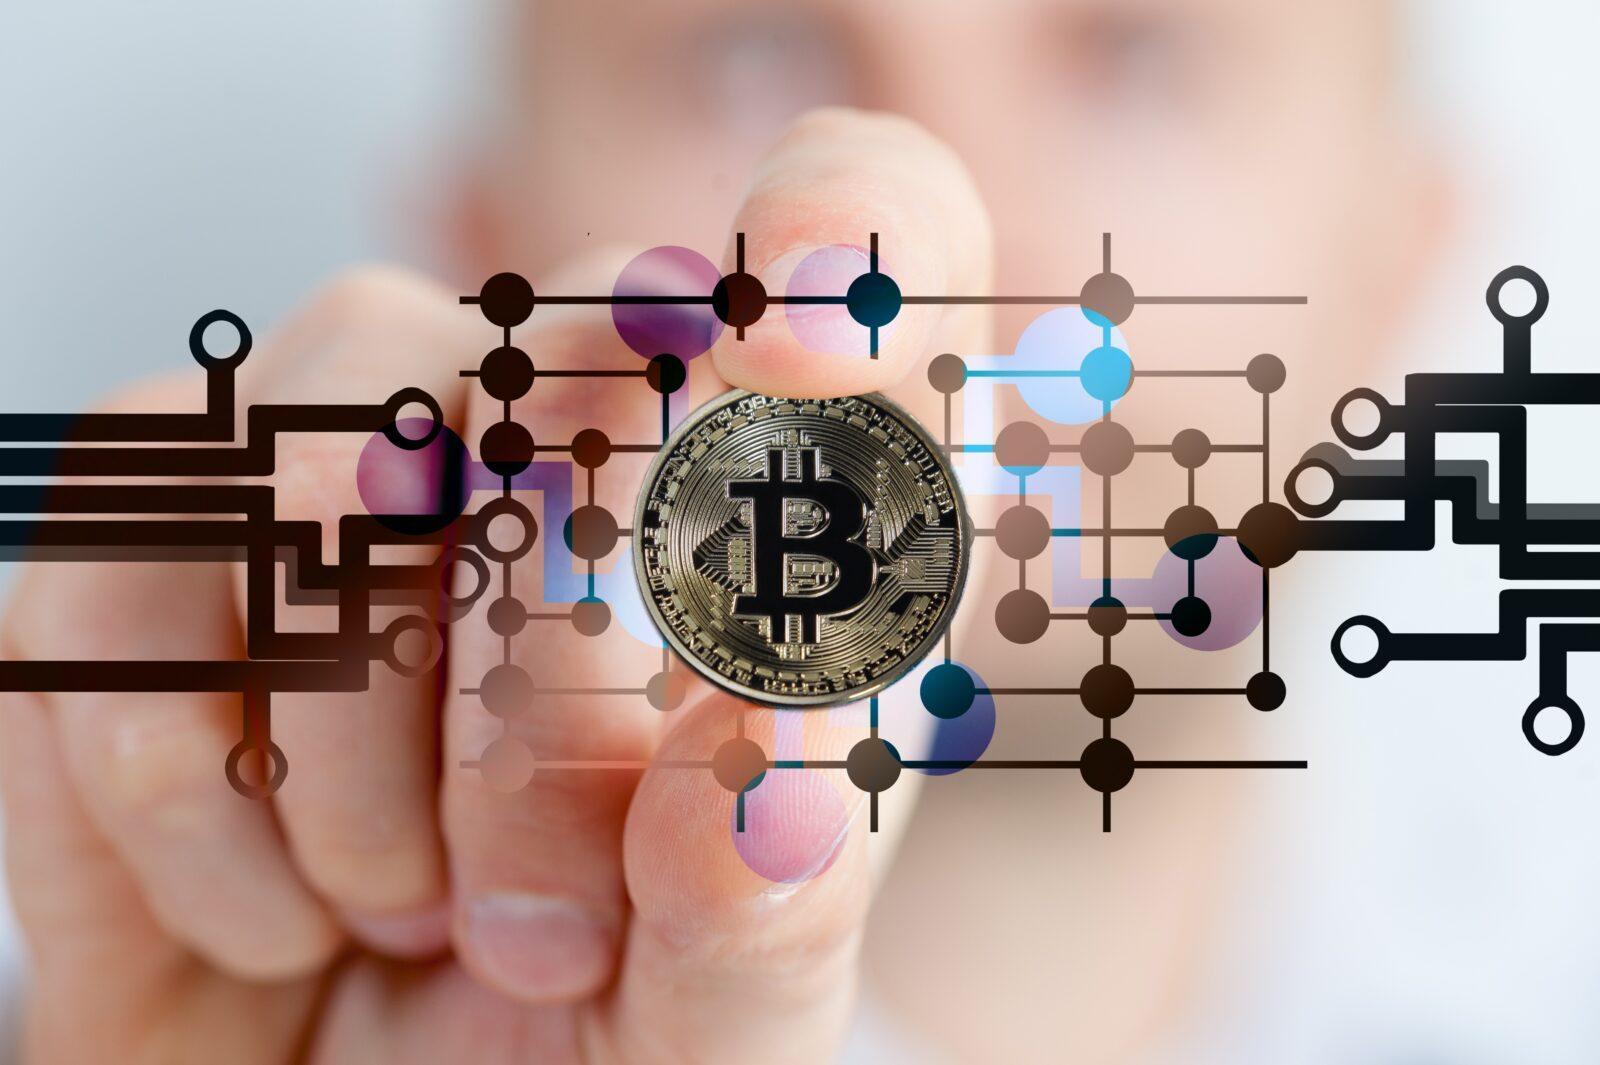 co to jest mining bitcoin